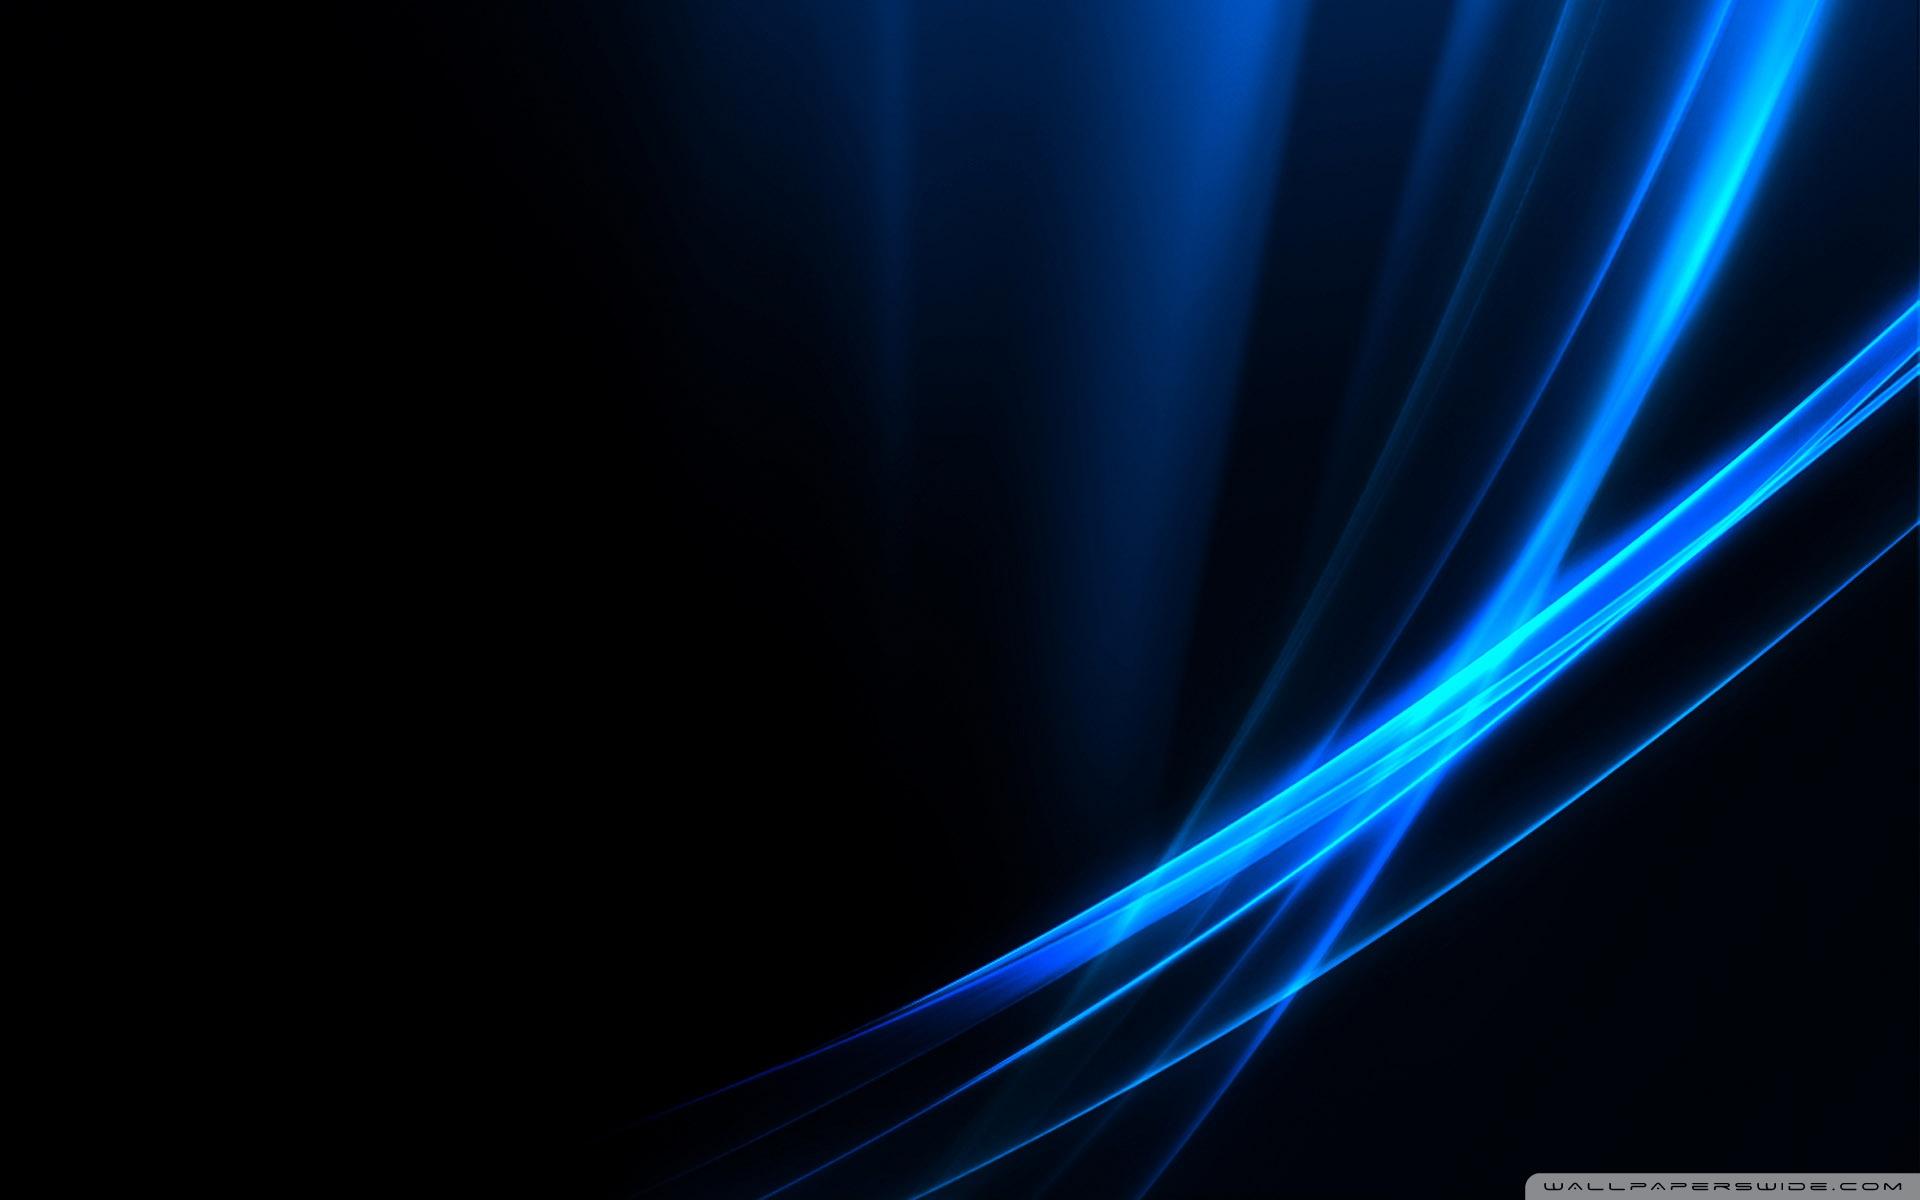 Windows Vista Aero 14 HD Wide Wallpaper for Widescreen